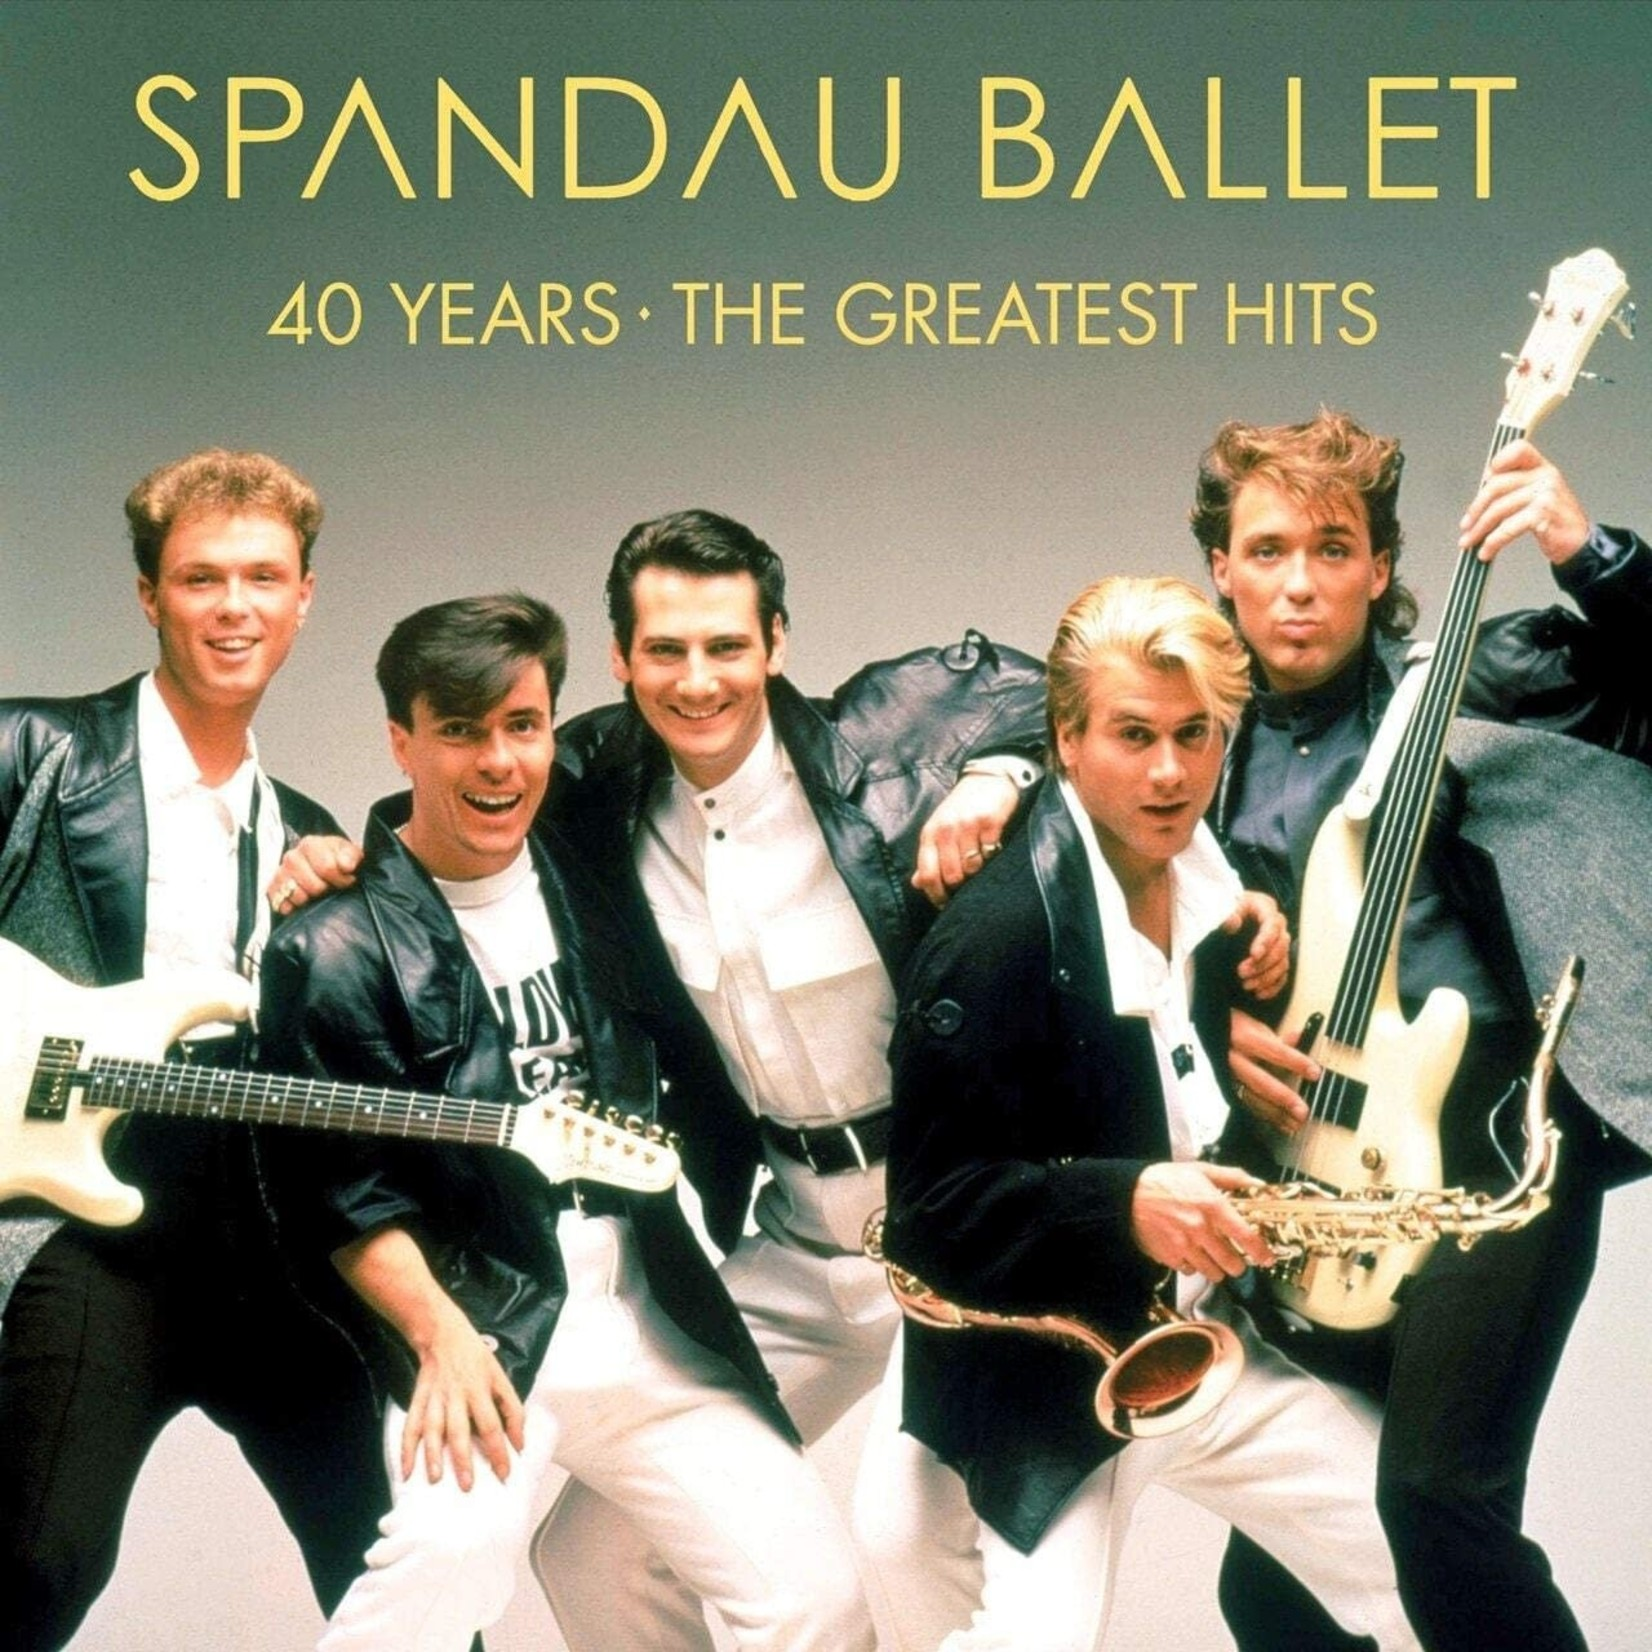 Vinyl Spandau Ballet - 40 Years The Greatest Hits